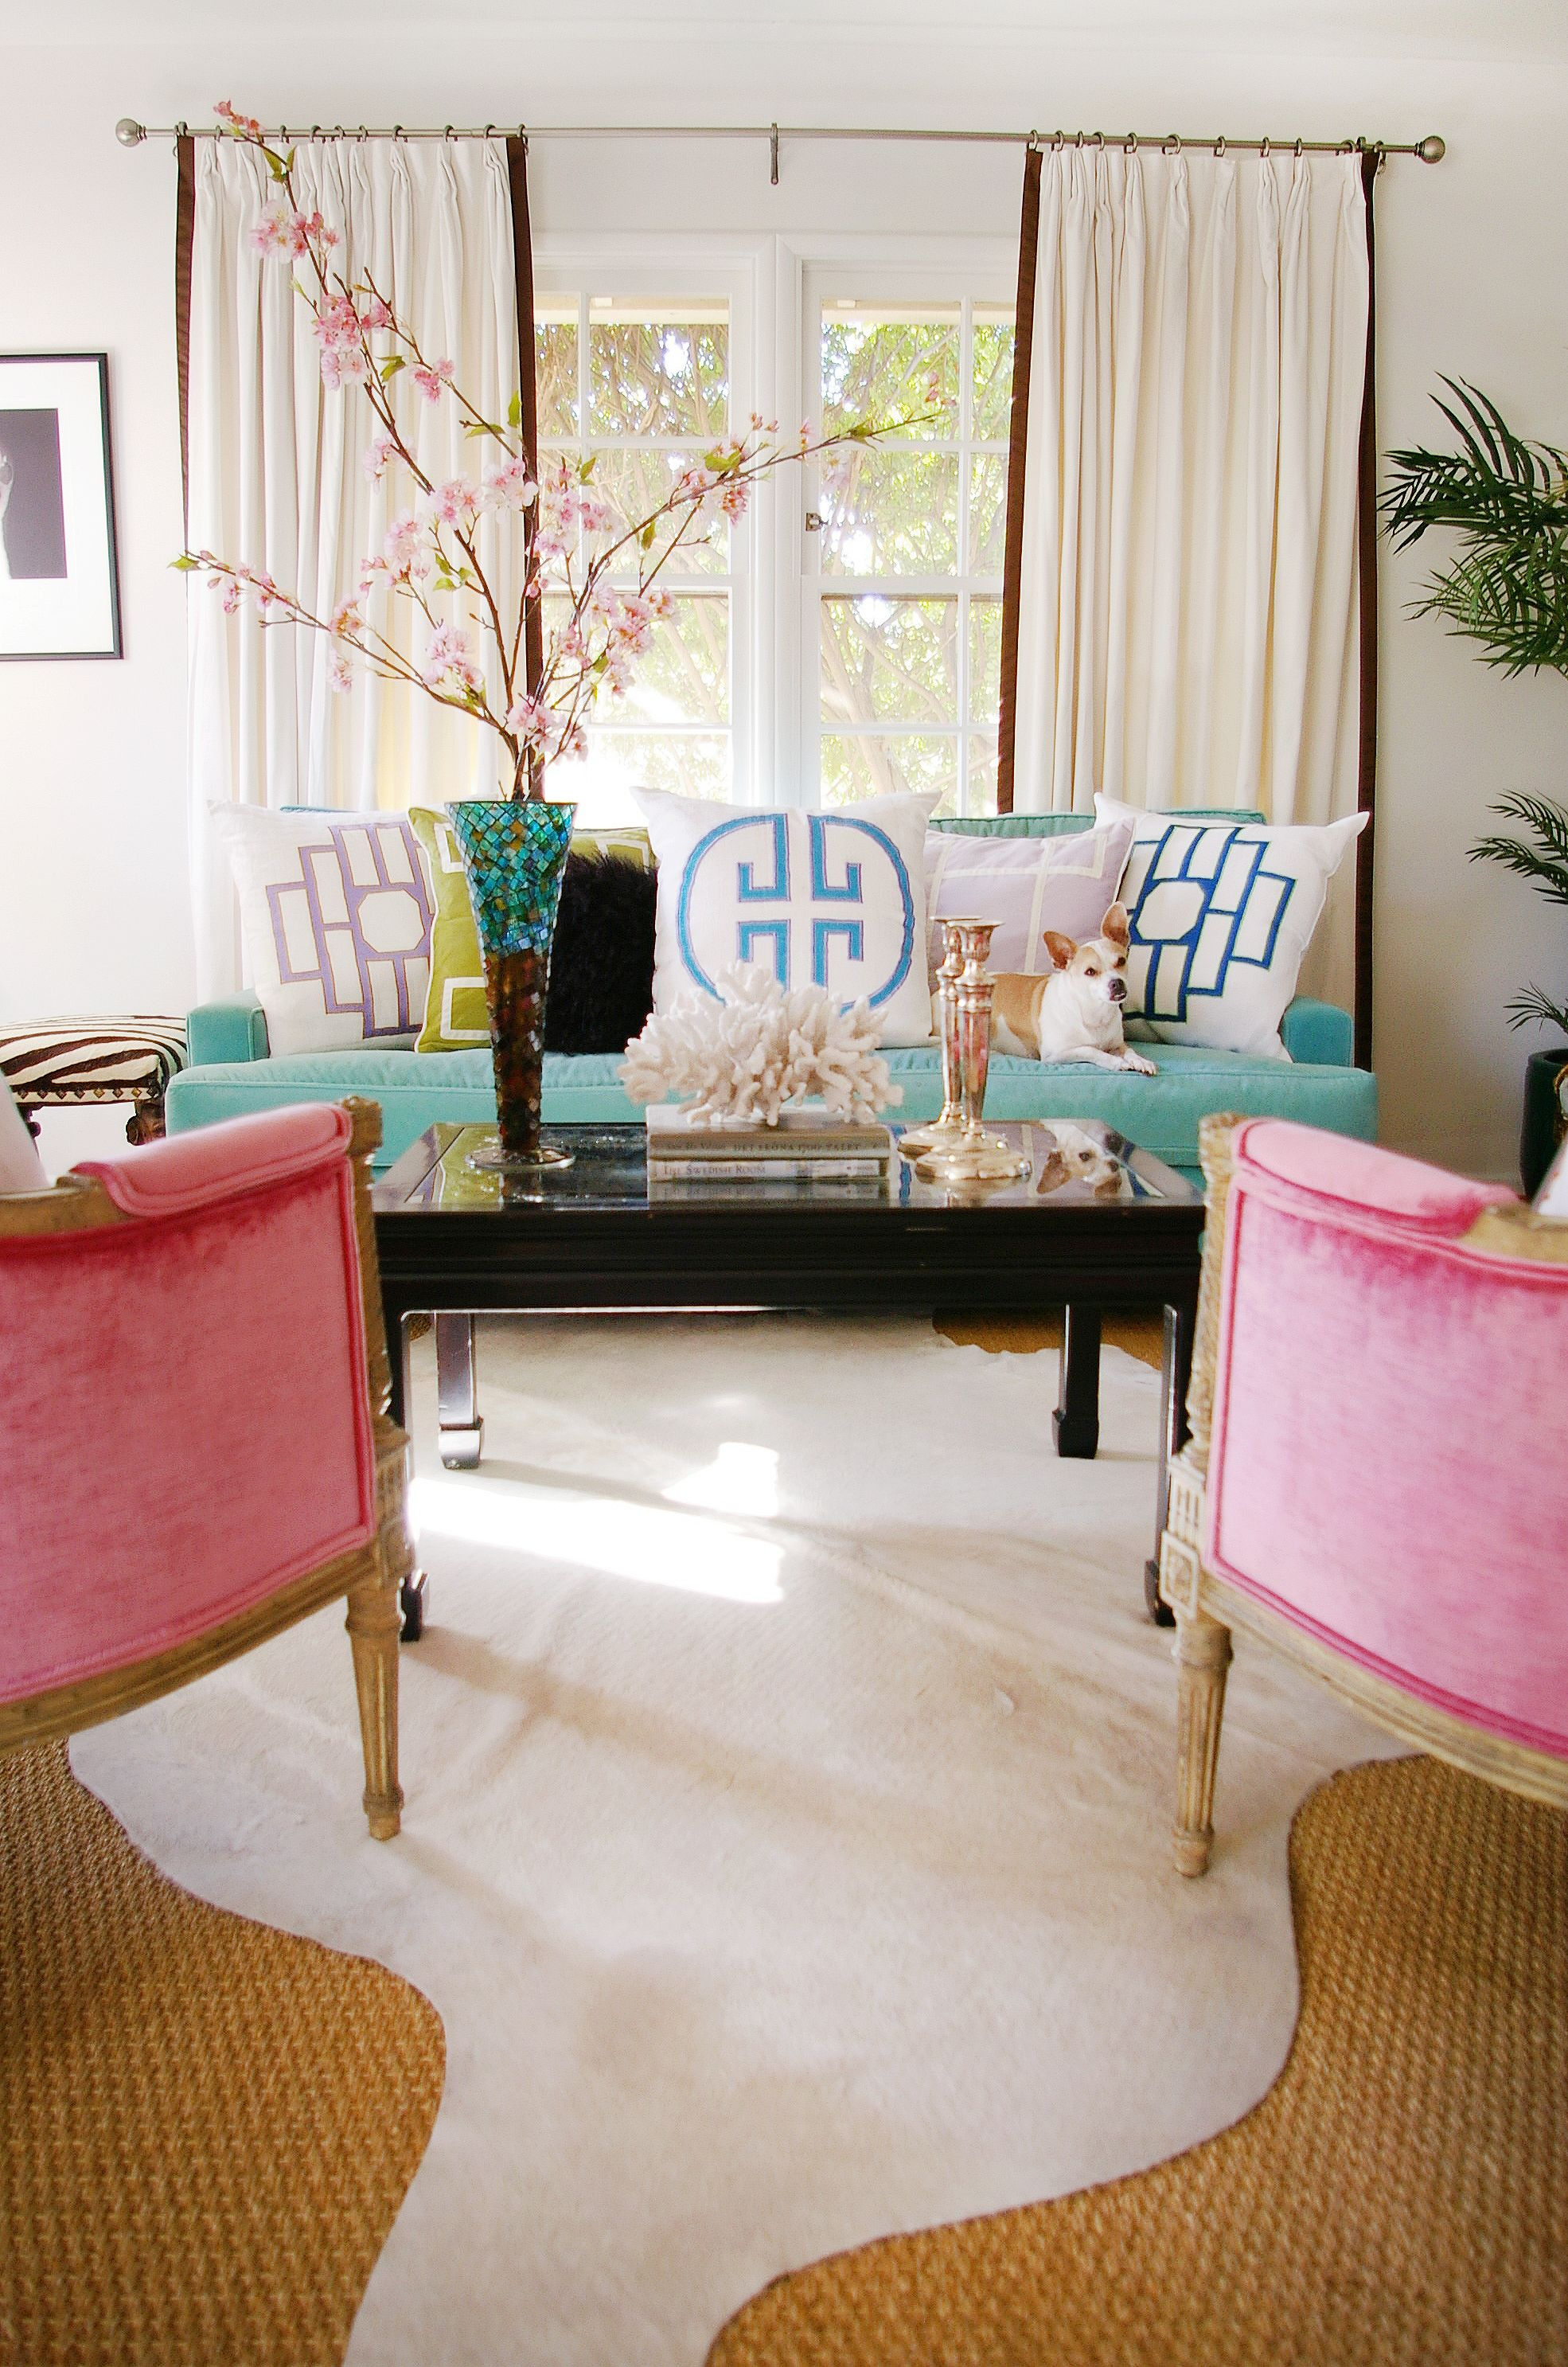 Interiorswwwjillsorensenbungalow Living Room With Alluring Bungalow Living Room Design Inspiration Design